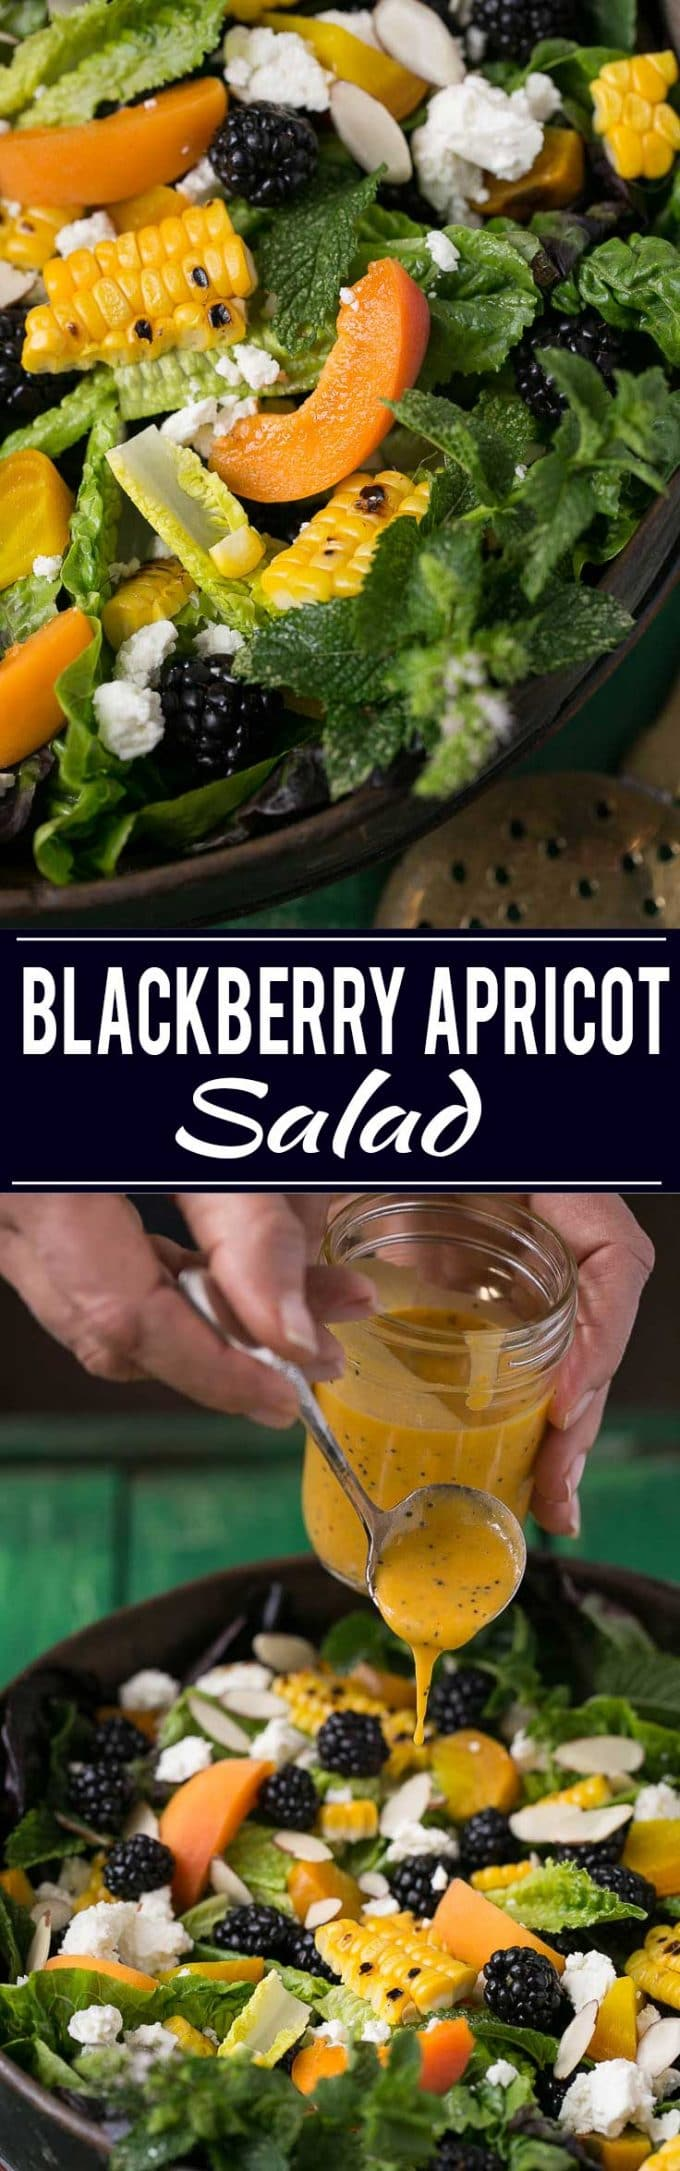 Blackberry Apricot Salad Recipe | Blackberry Apricot Salad | Summer Salad | Poppyseed Dressing Recipe | Best Poppyseed Dressing